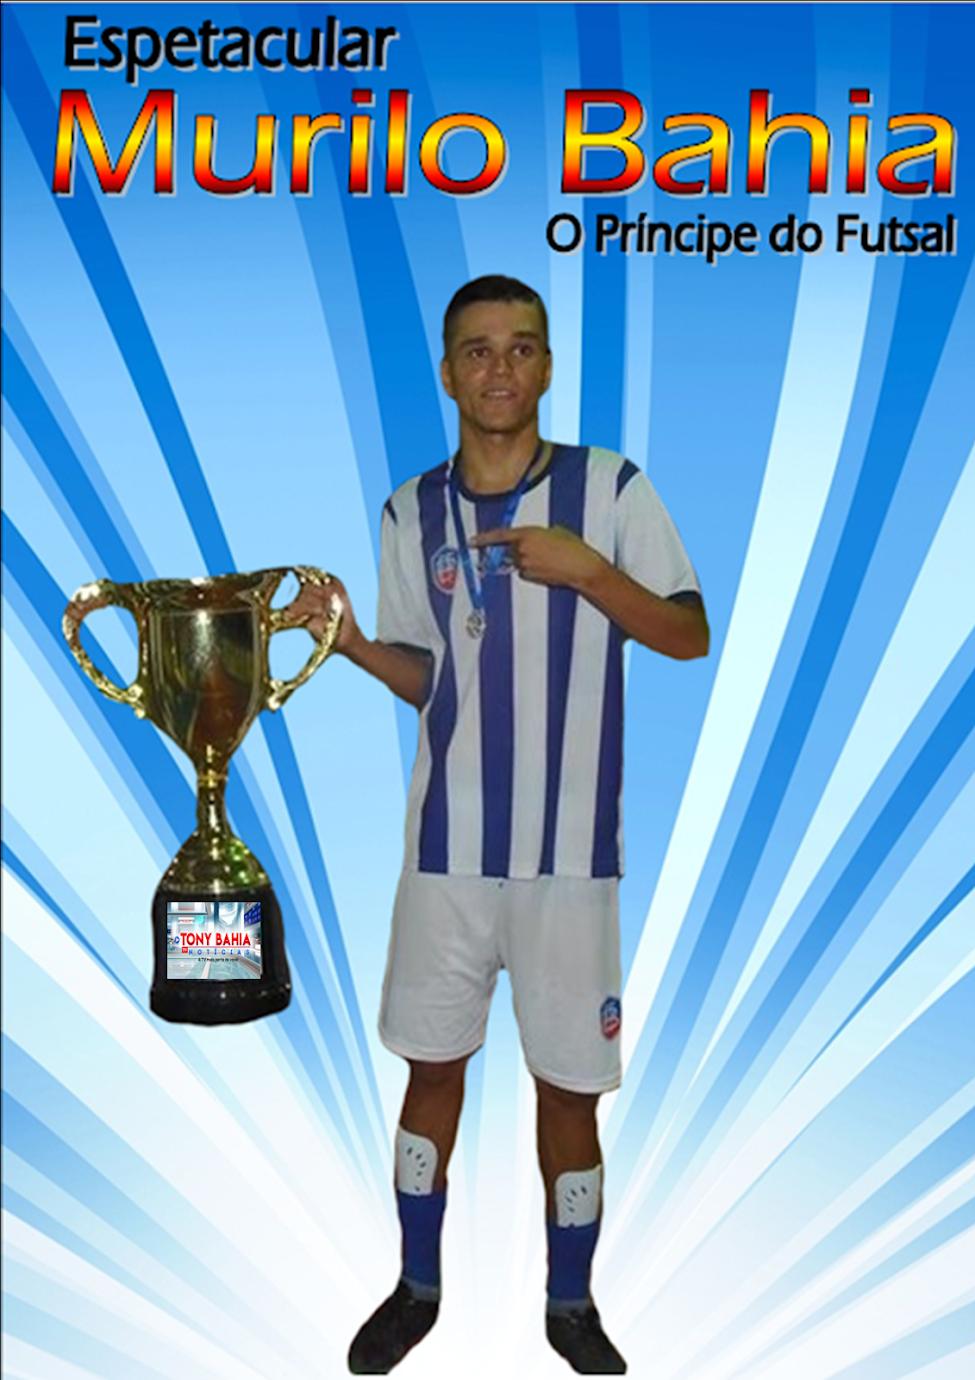 Espetacular Murilo Bahia